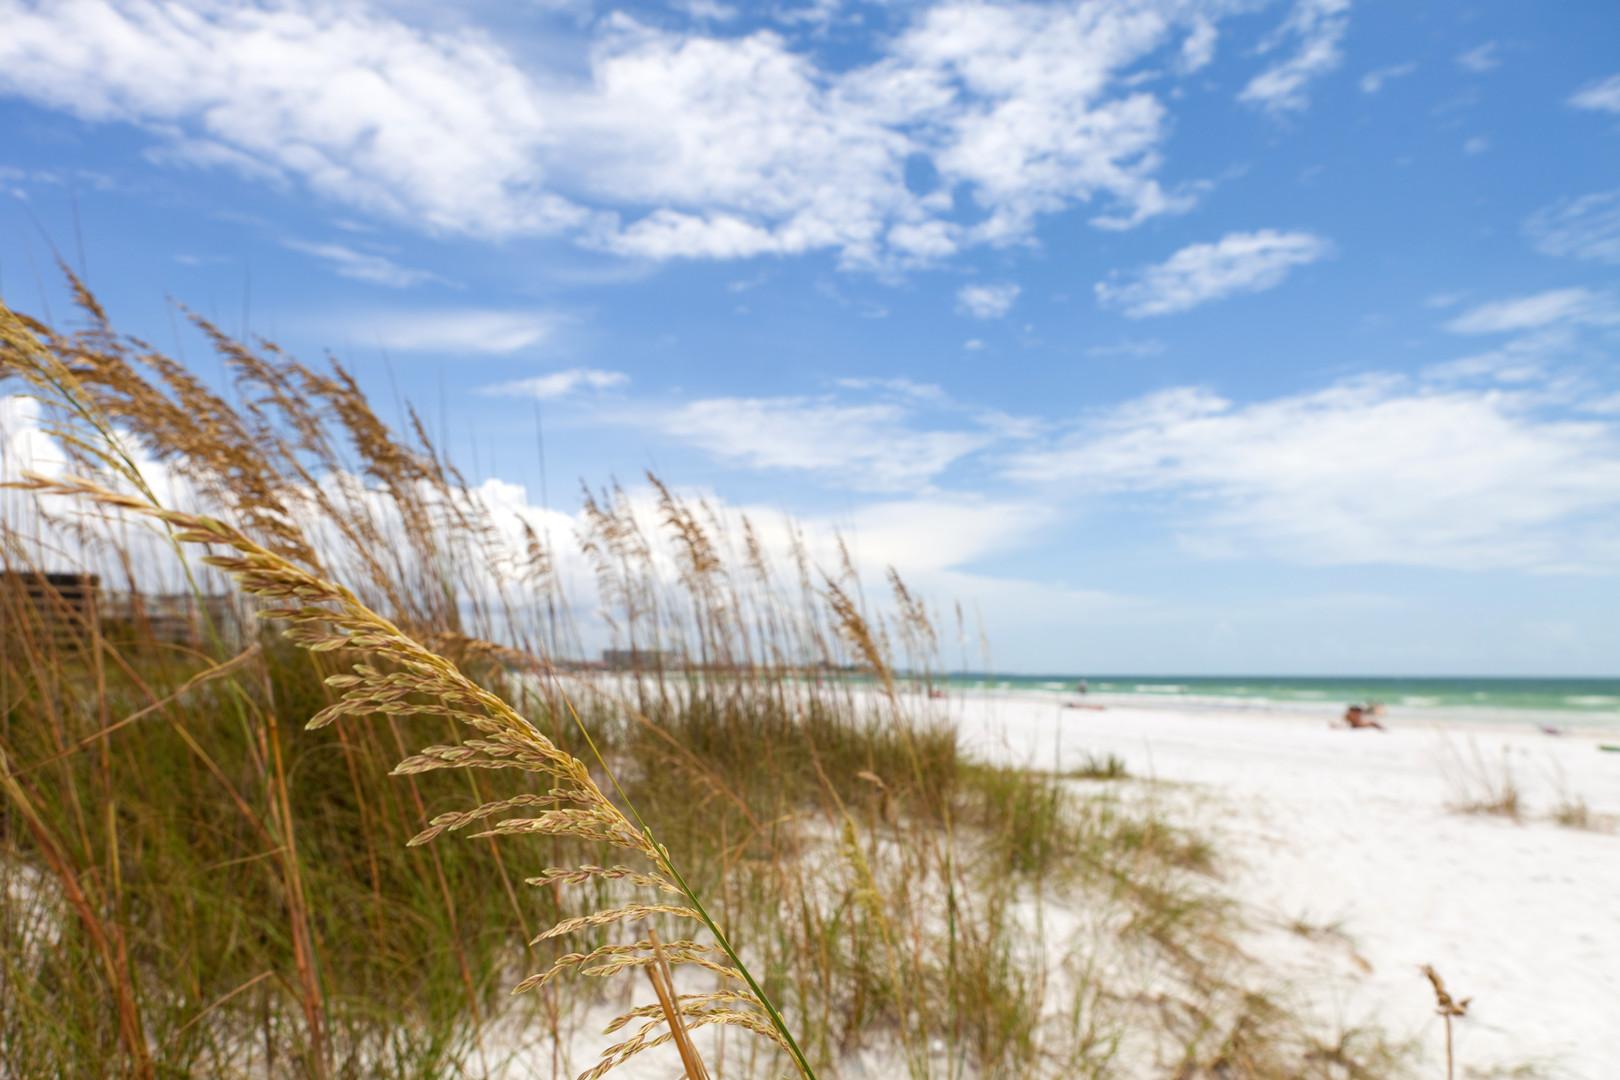 siesta-key-beach-is-located-on-the-gulf-